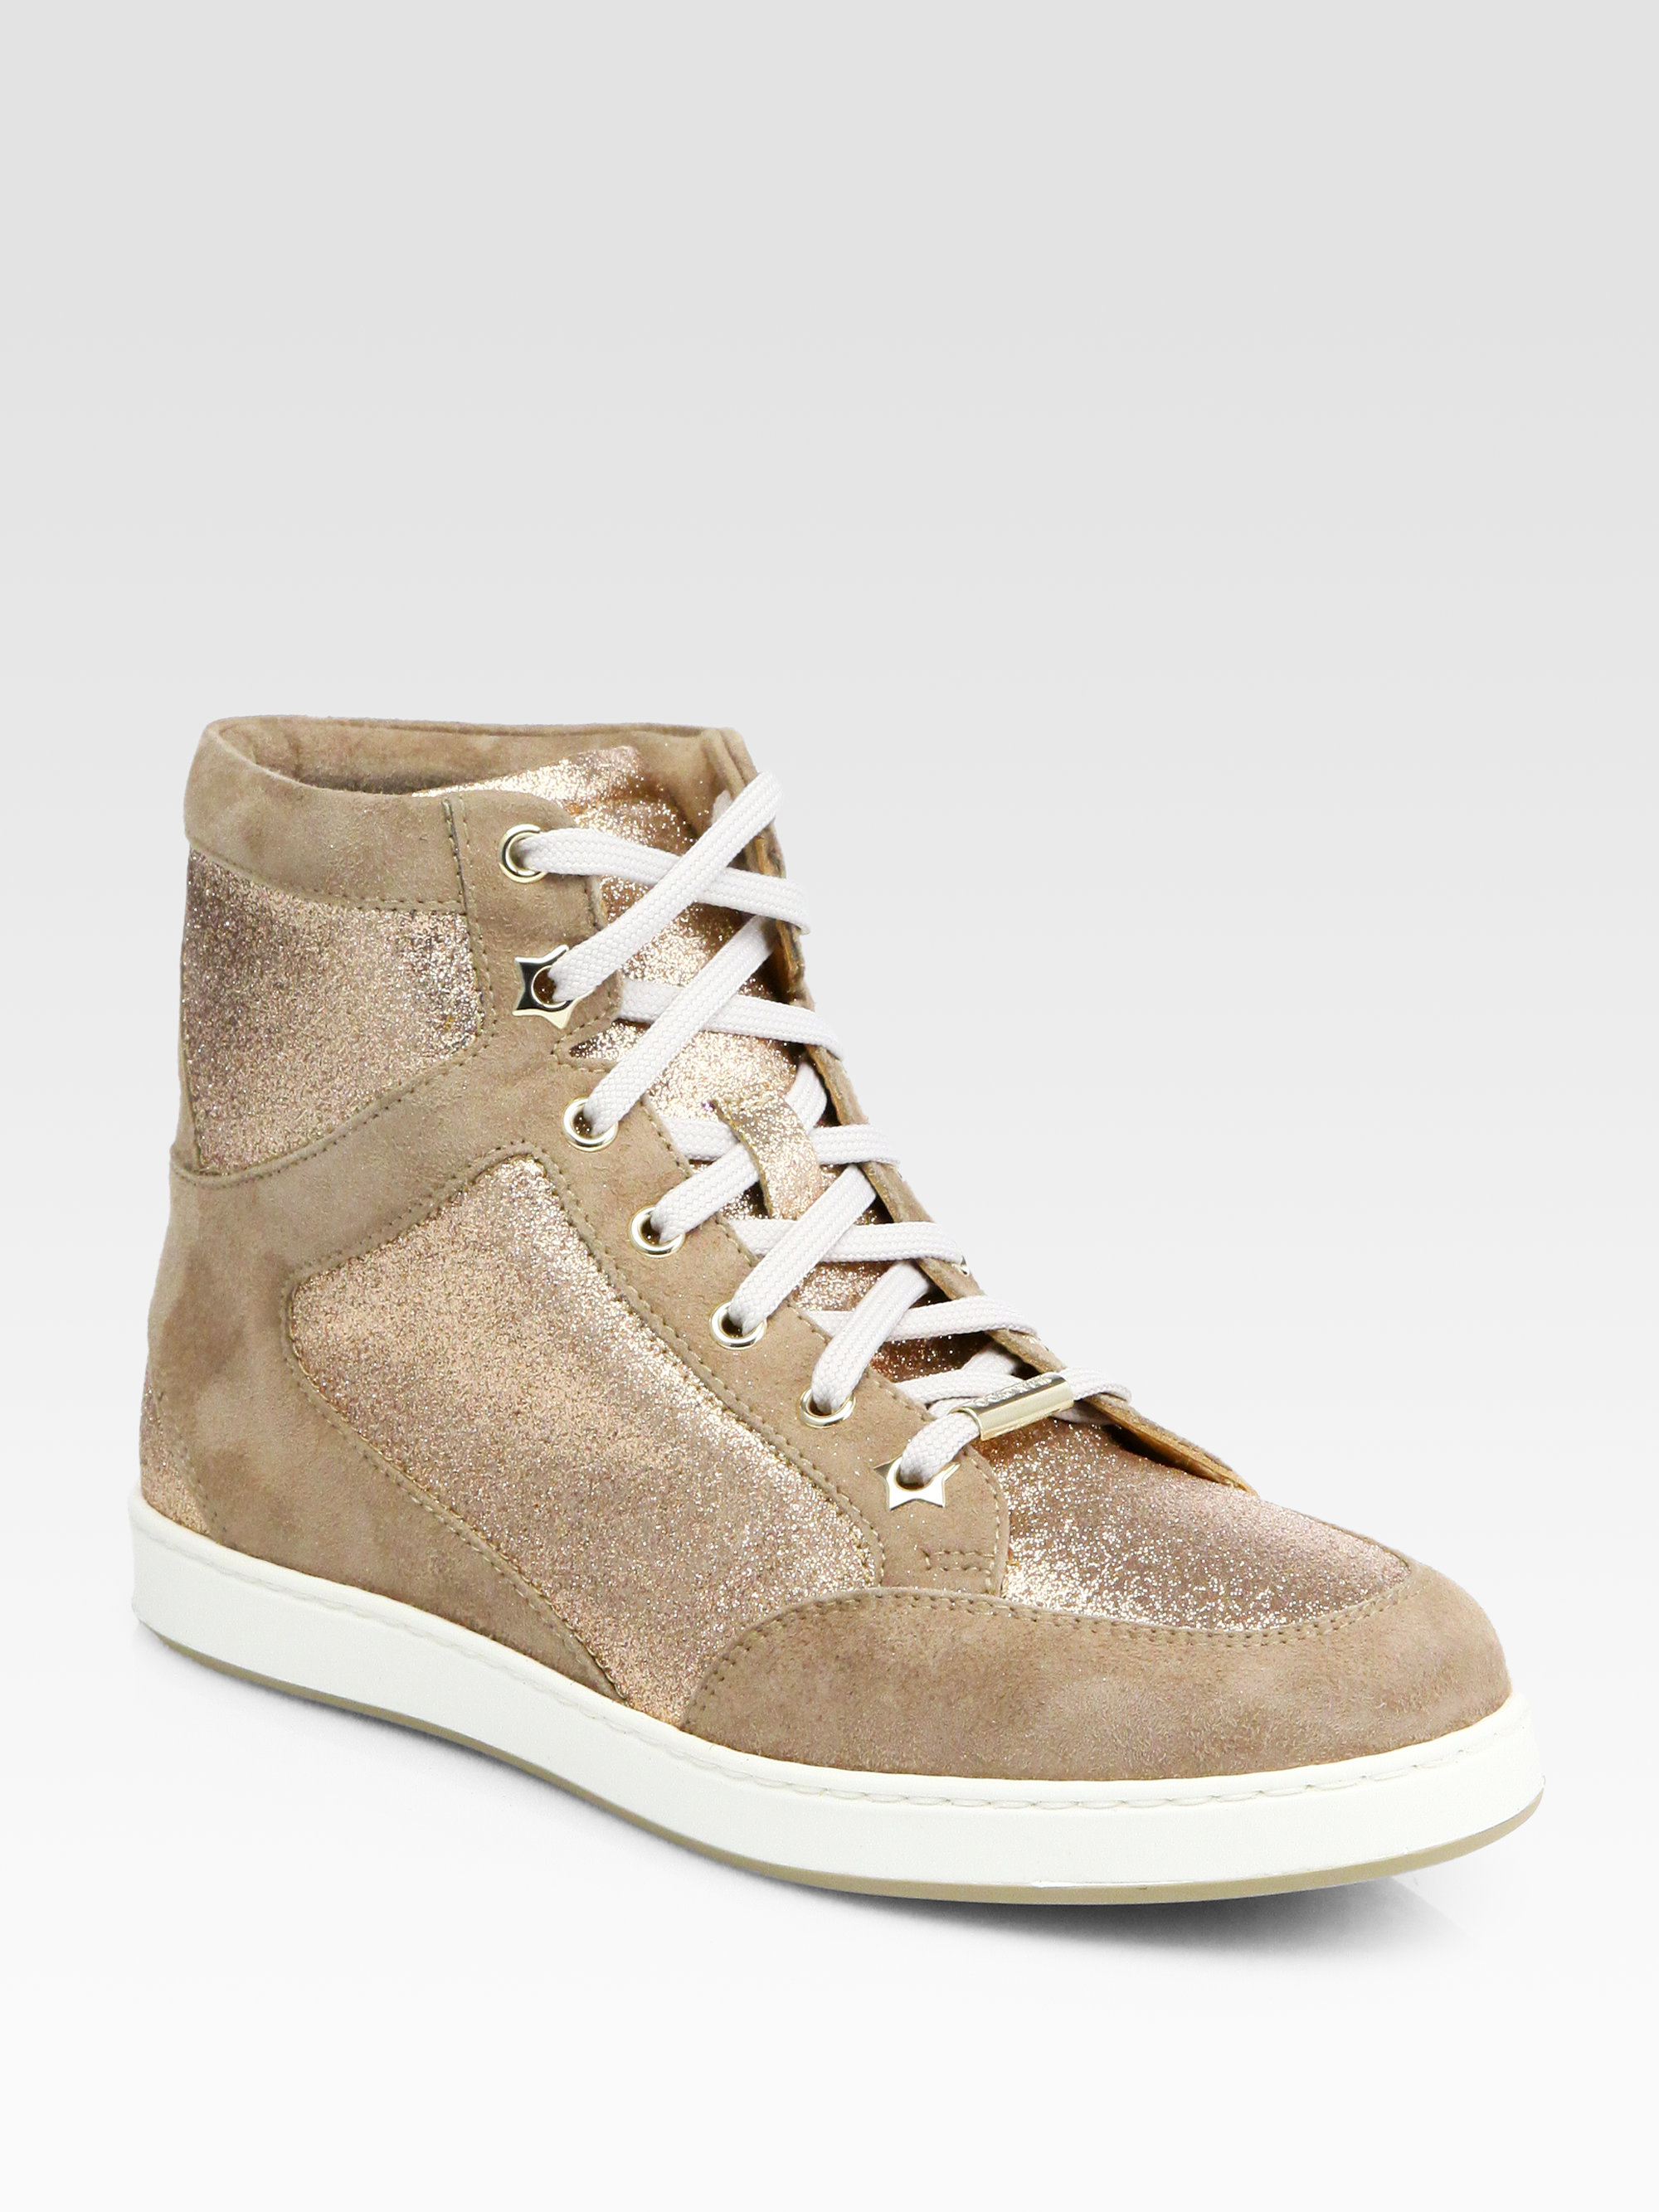 788bf68563c Lyst - Jimmy Choo Tokyo Glitter Suede Hightop Sneakers in Natural